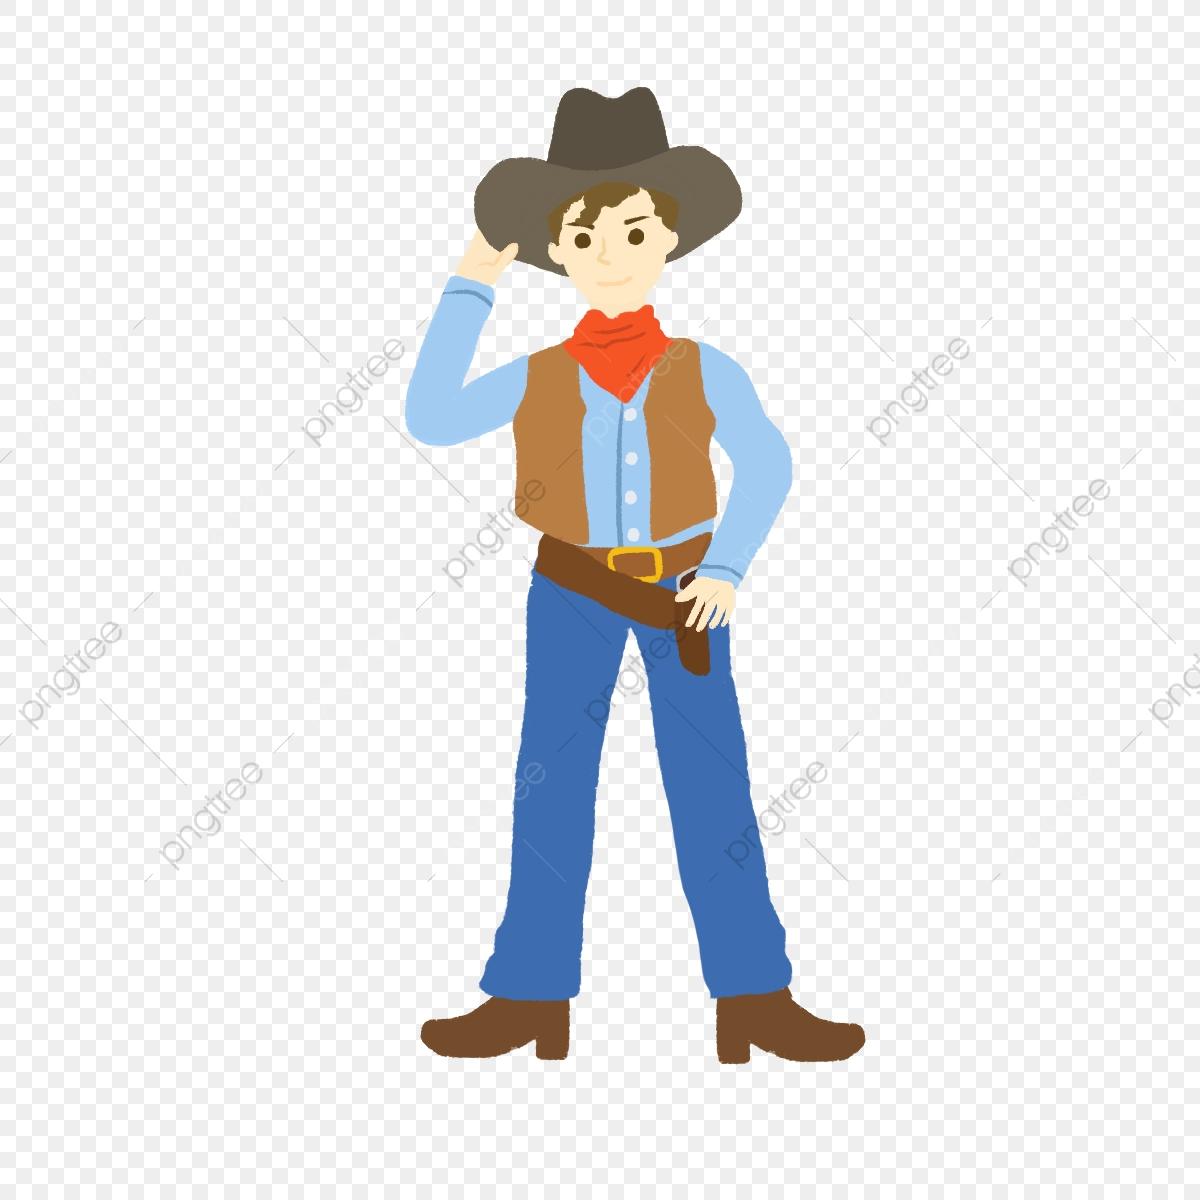 Cowboy clipart cowboy texas. Png transparent image